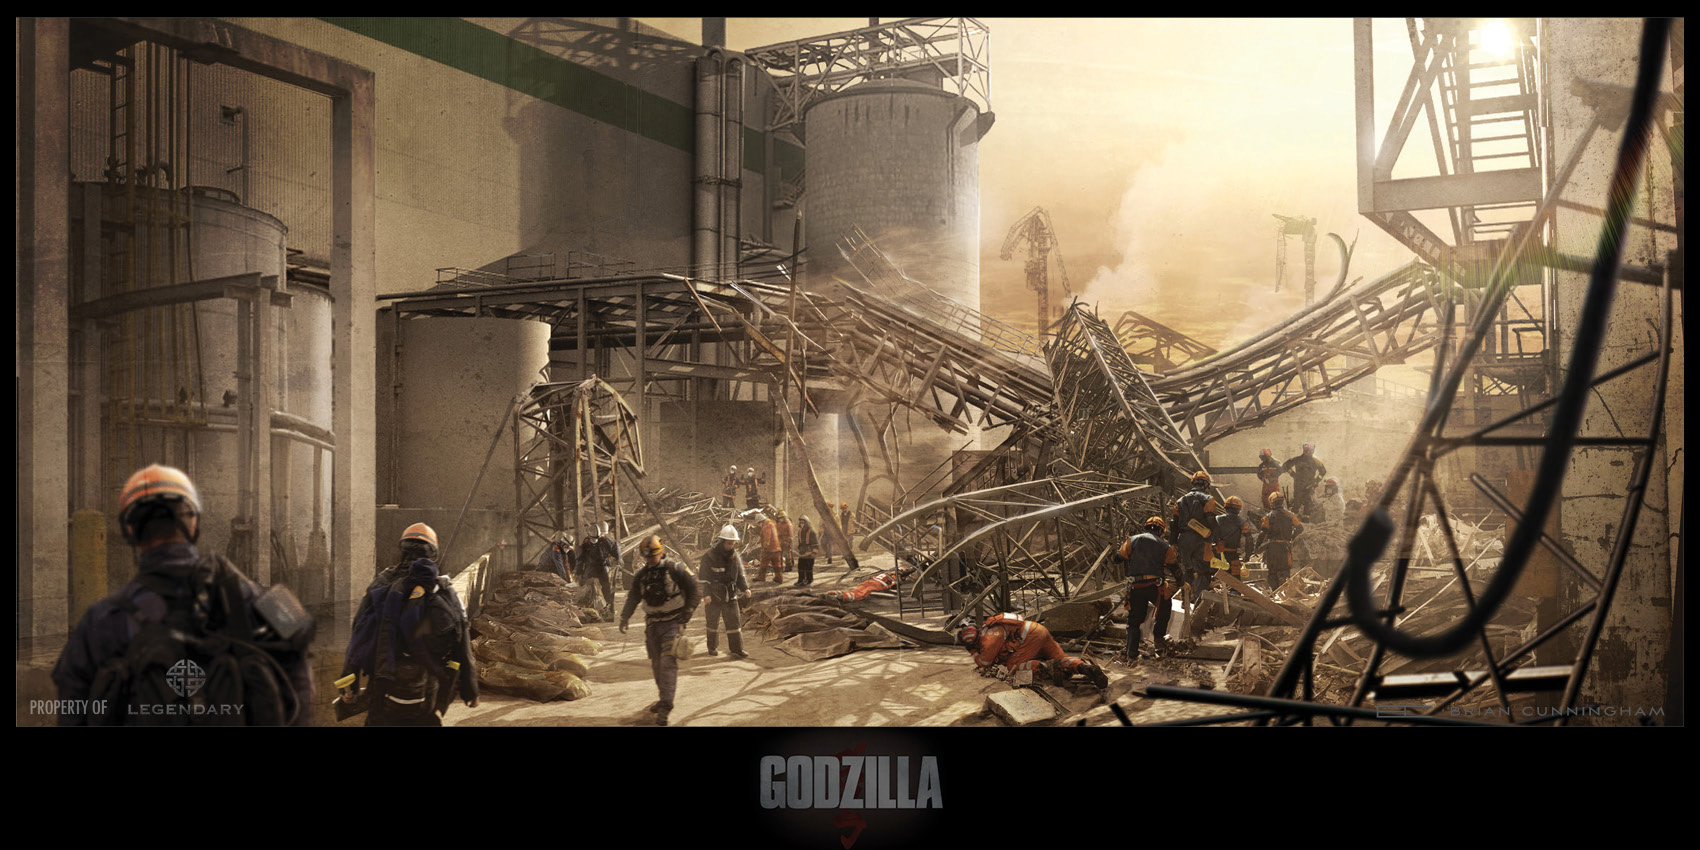 Godzilla Concept Art by Brian Cunningham (10 pics)